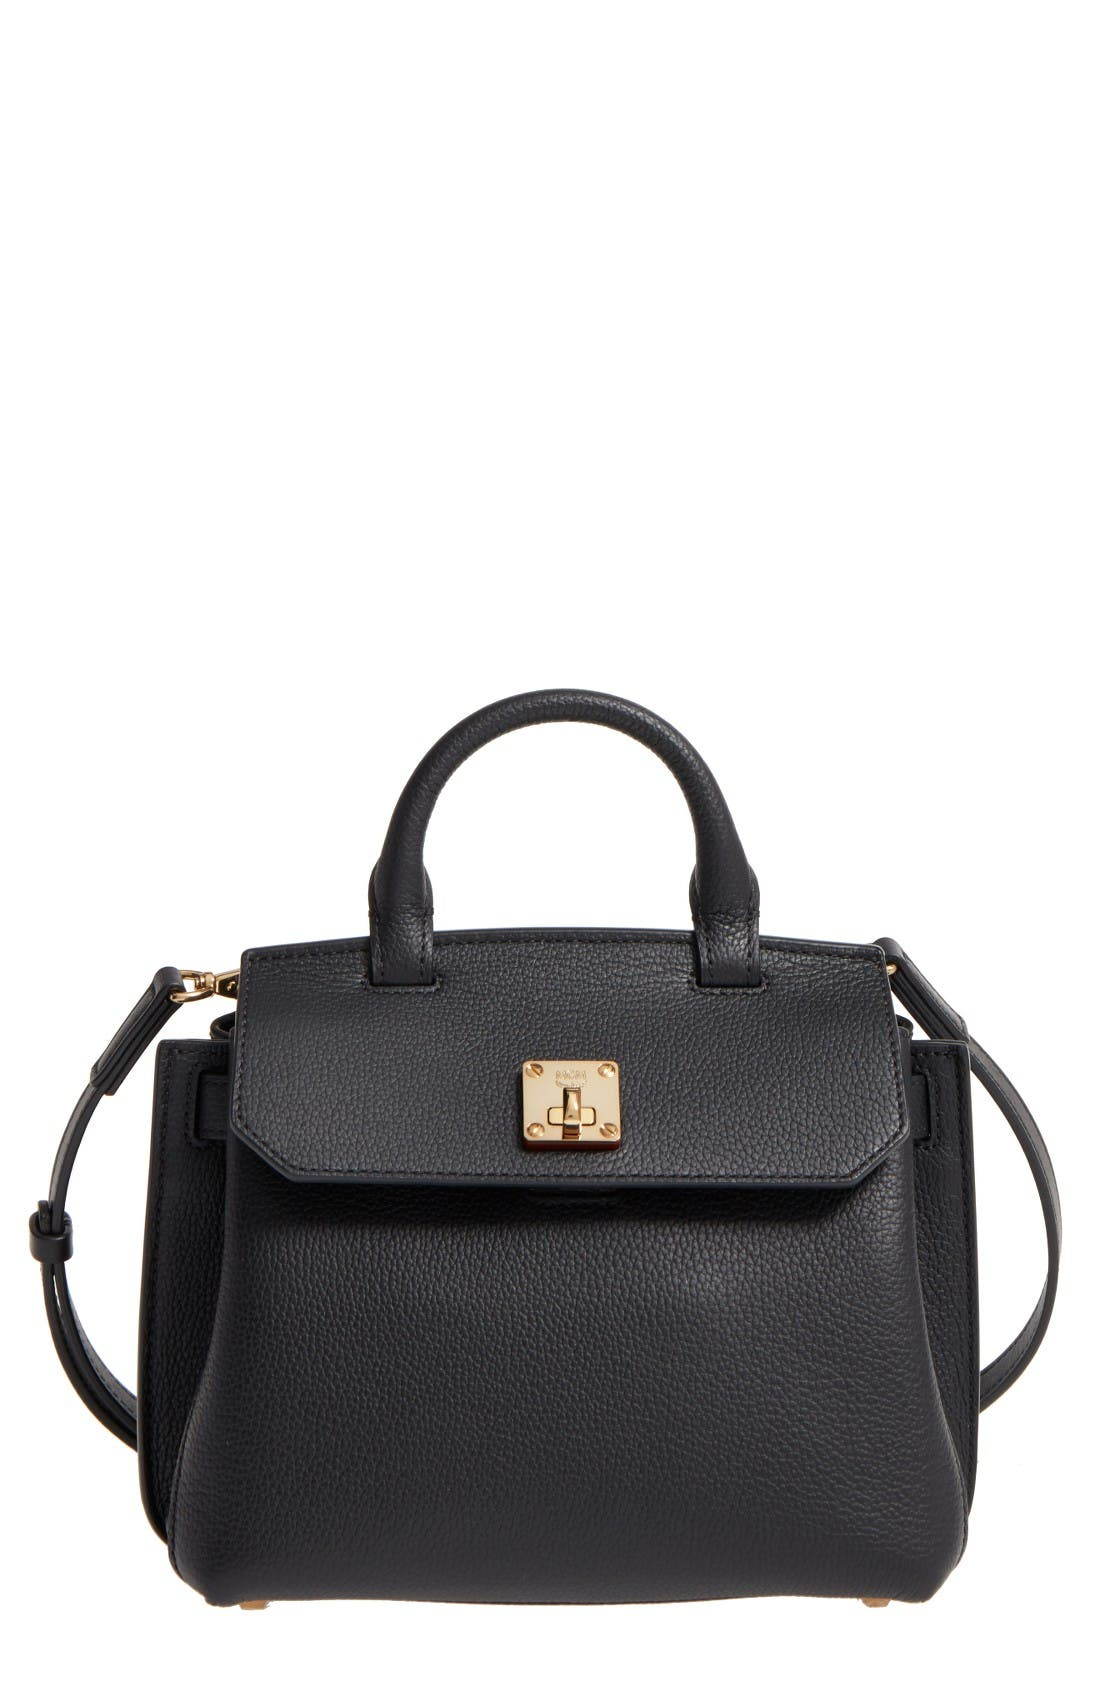 Main Image - MCM Milla Leather Crossbody Bag